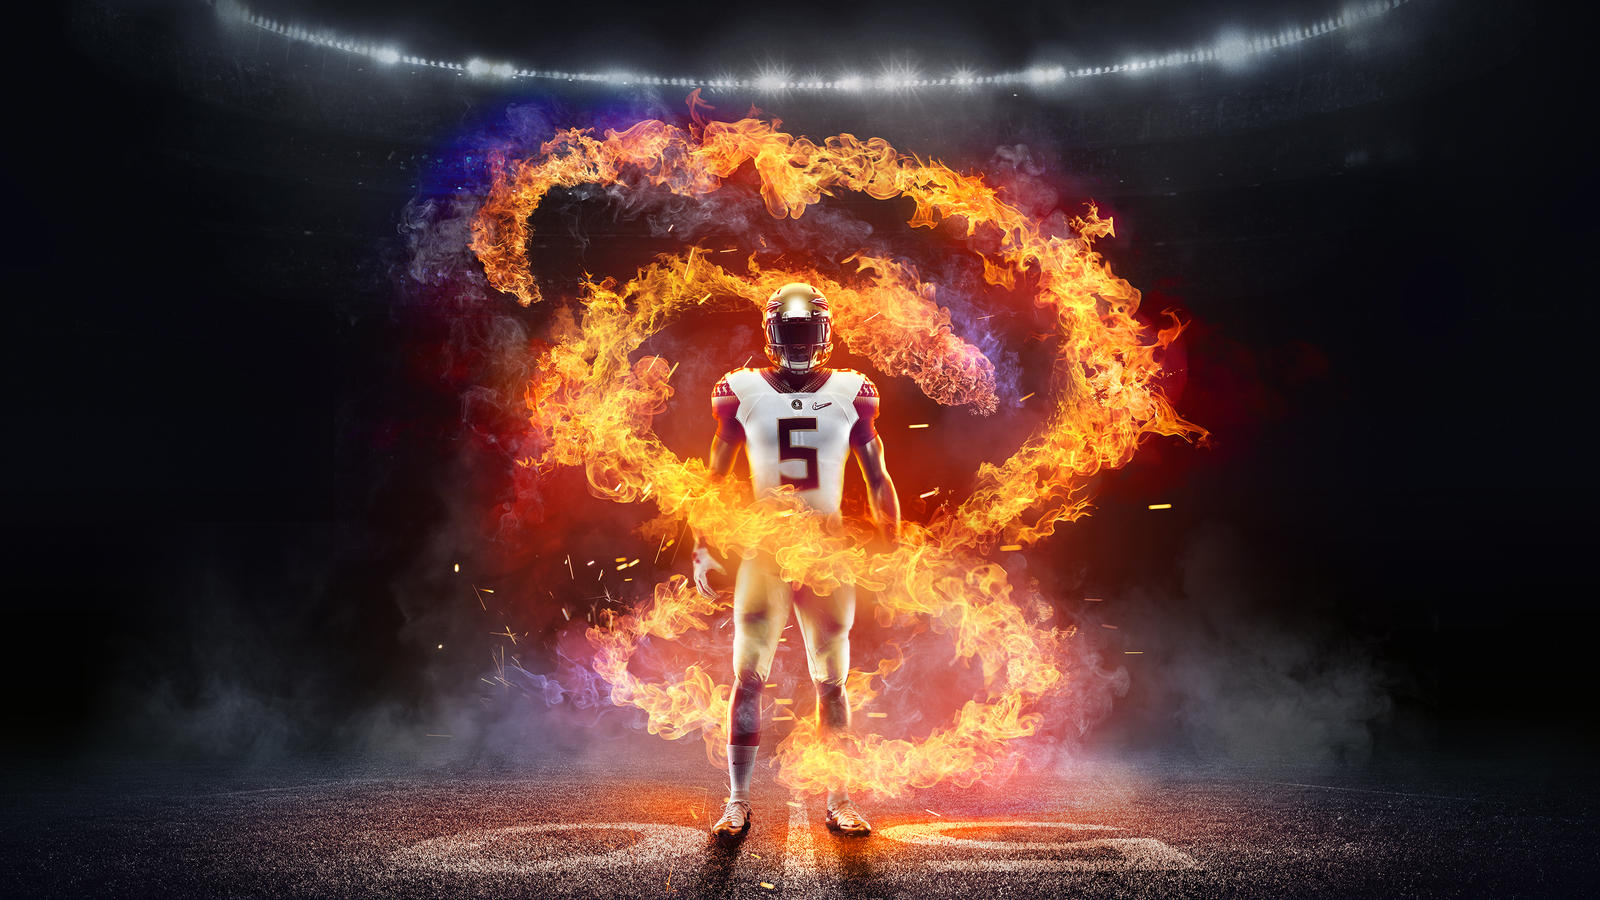 Oregon Football Wallpaper Hd Four Nike Sponsored Teams Battle For College Football